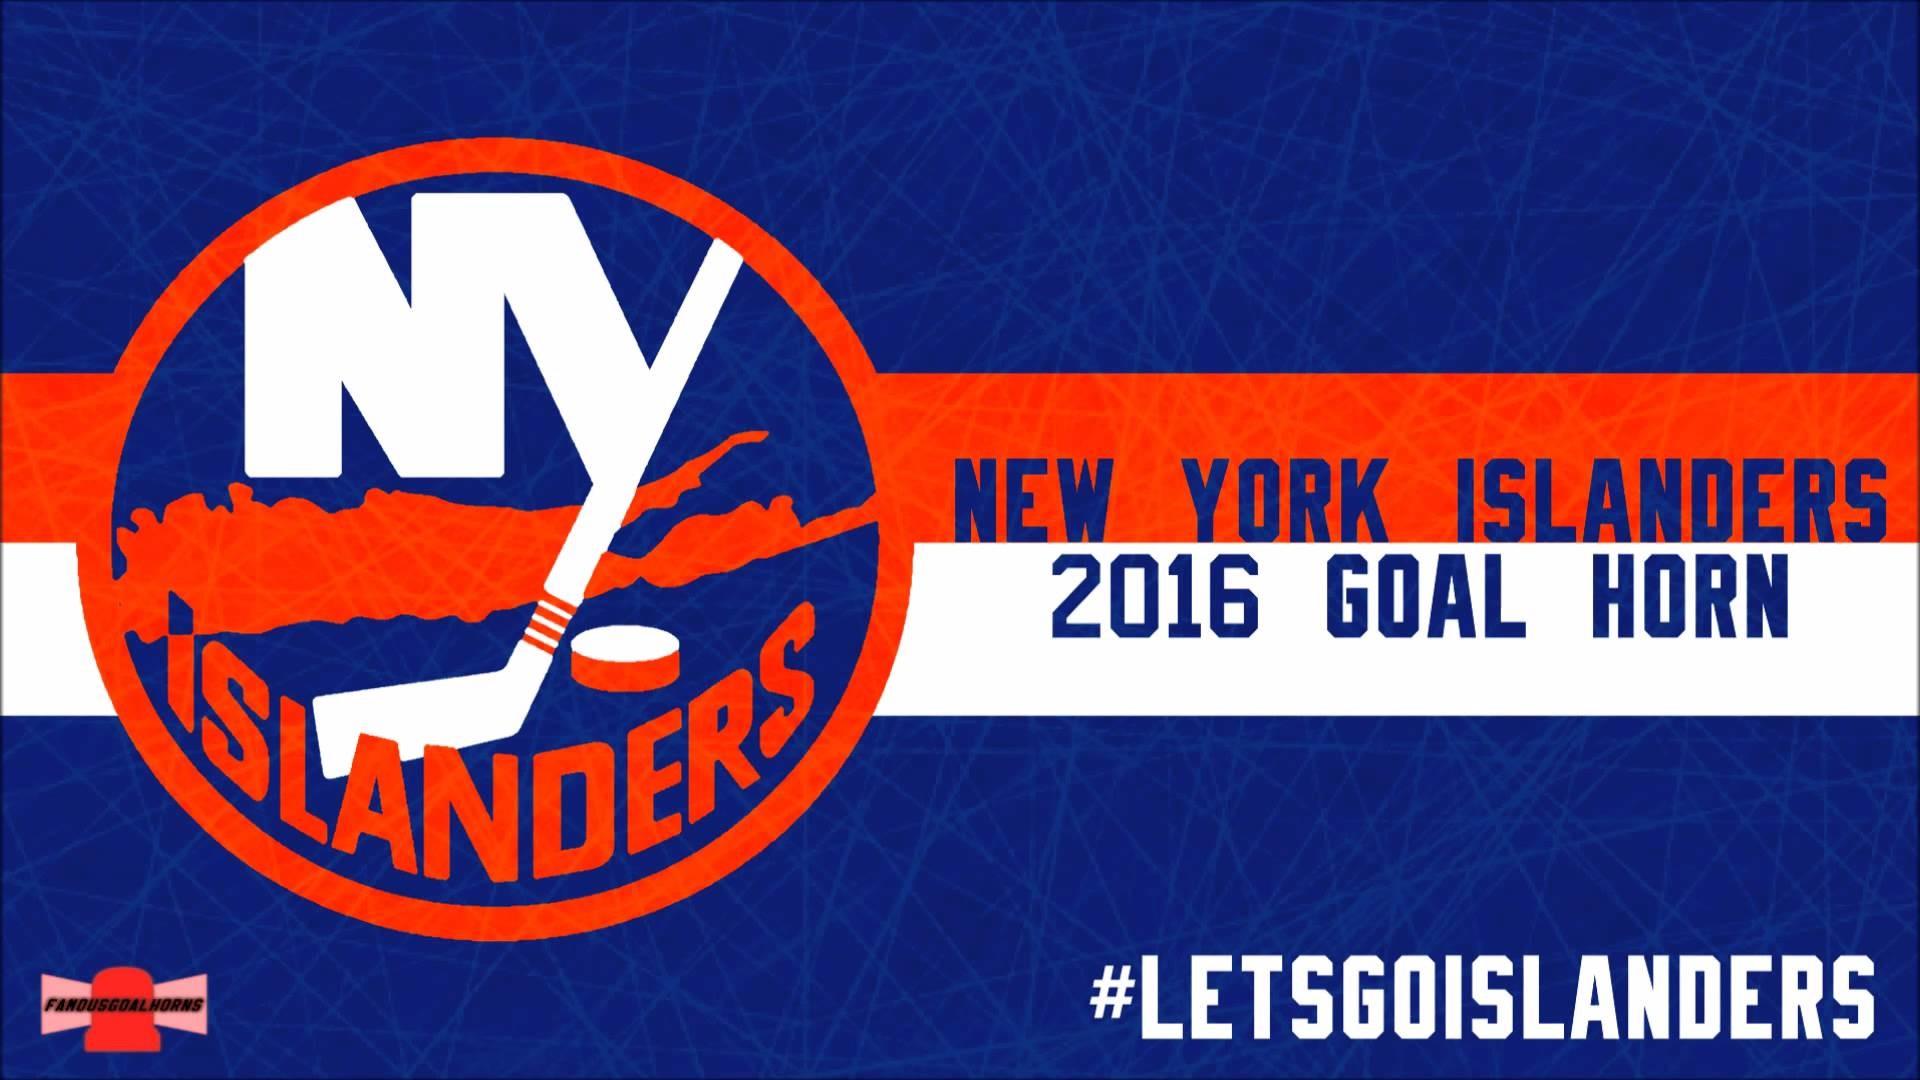 New York Islanders Vs Montreal